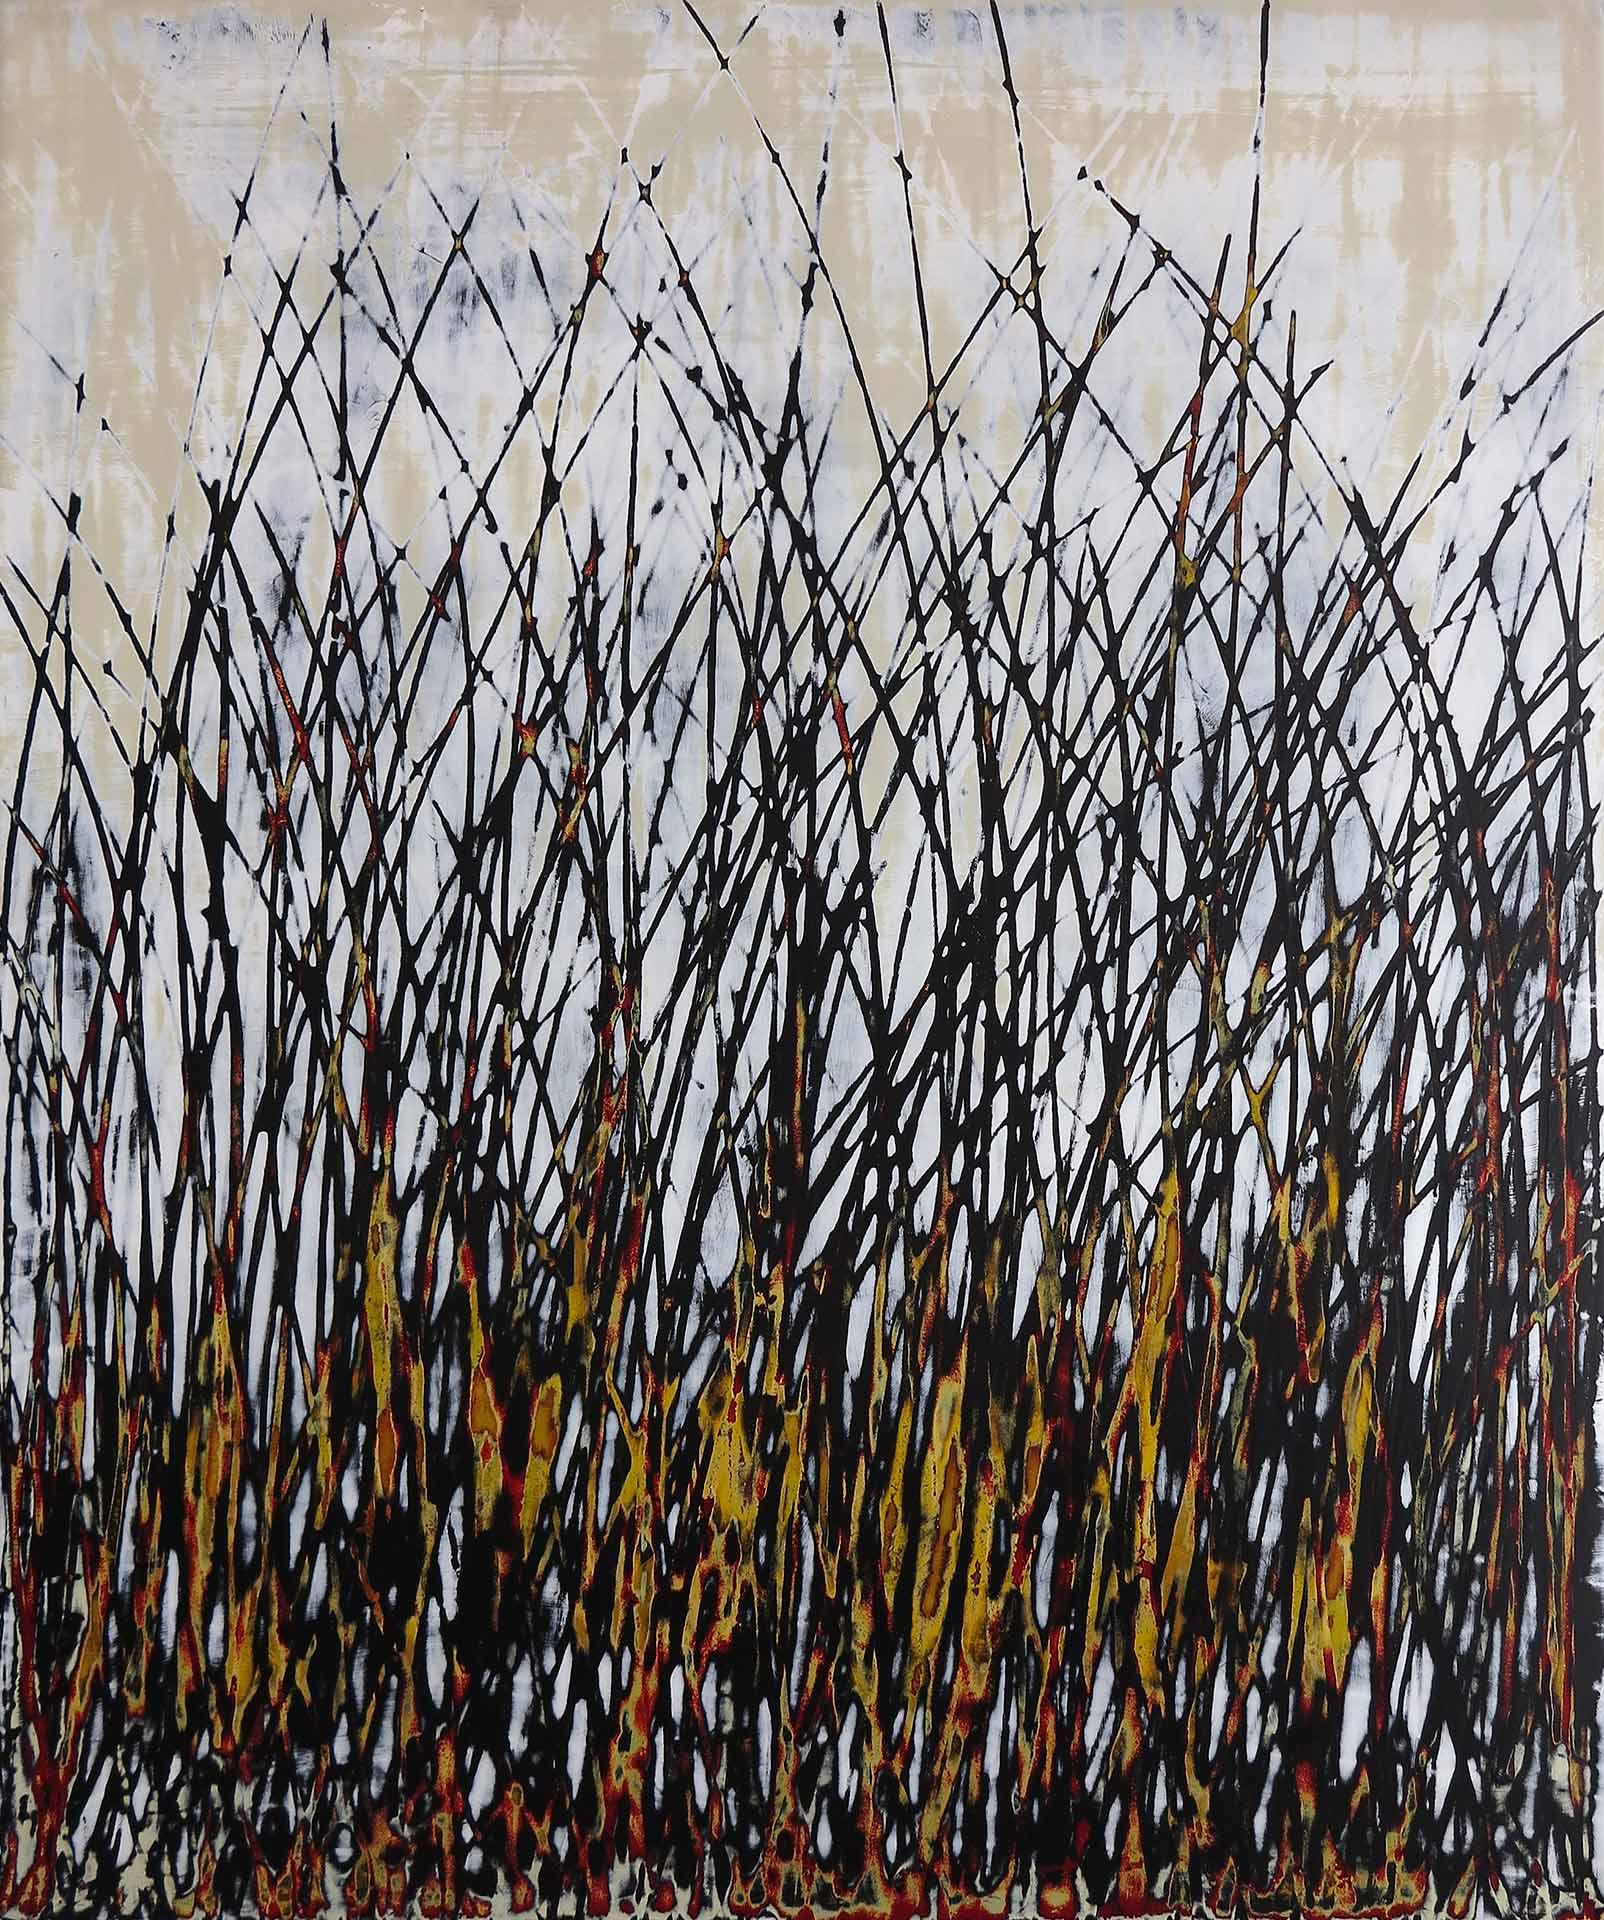 Tuval üzeri akrilik – Acrylic on canvas 69*57 cm